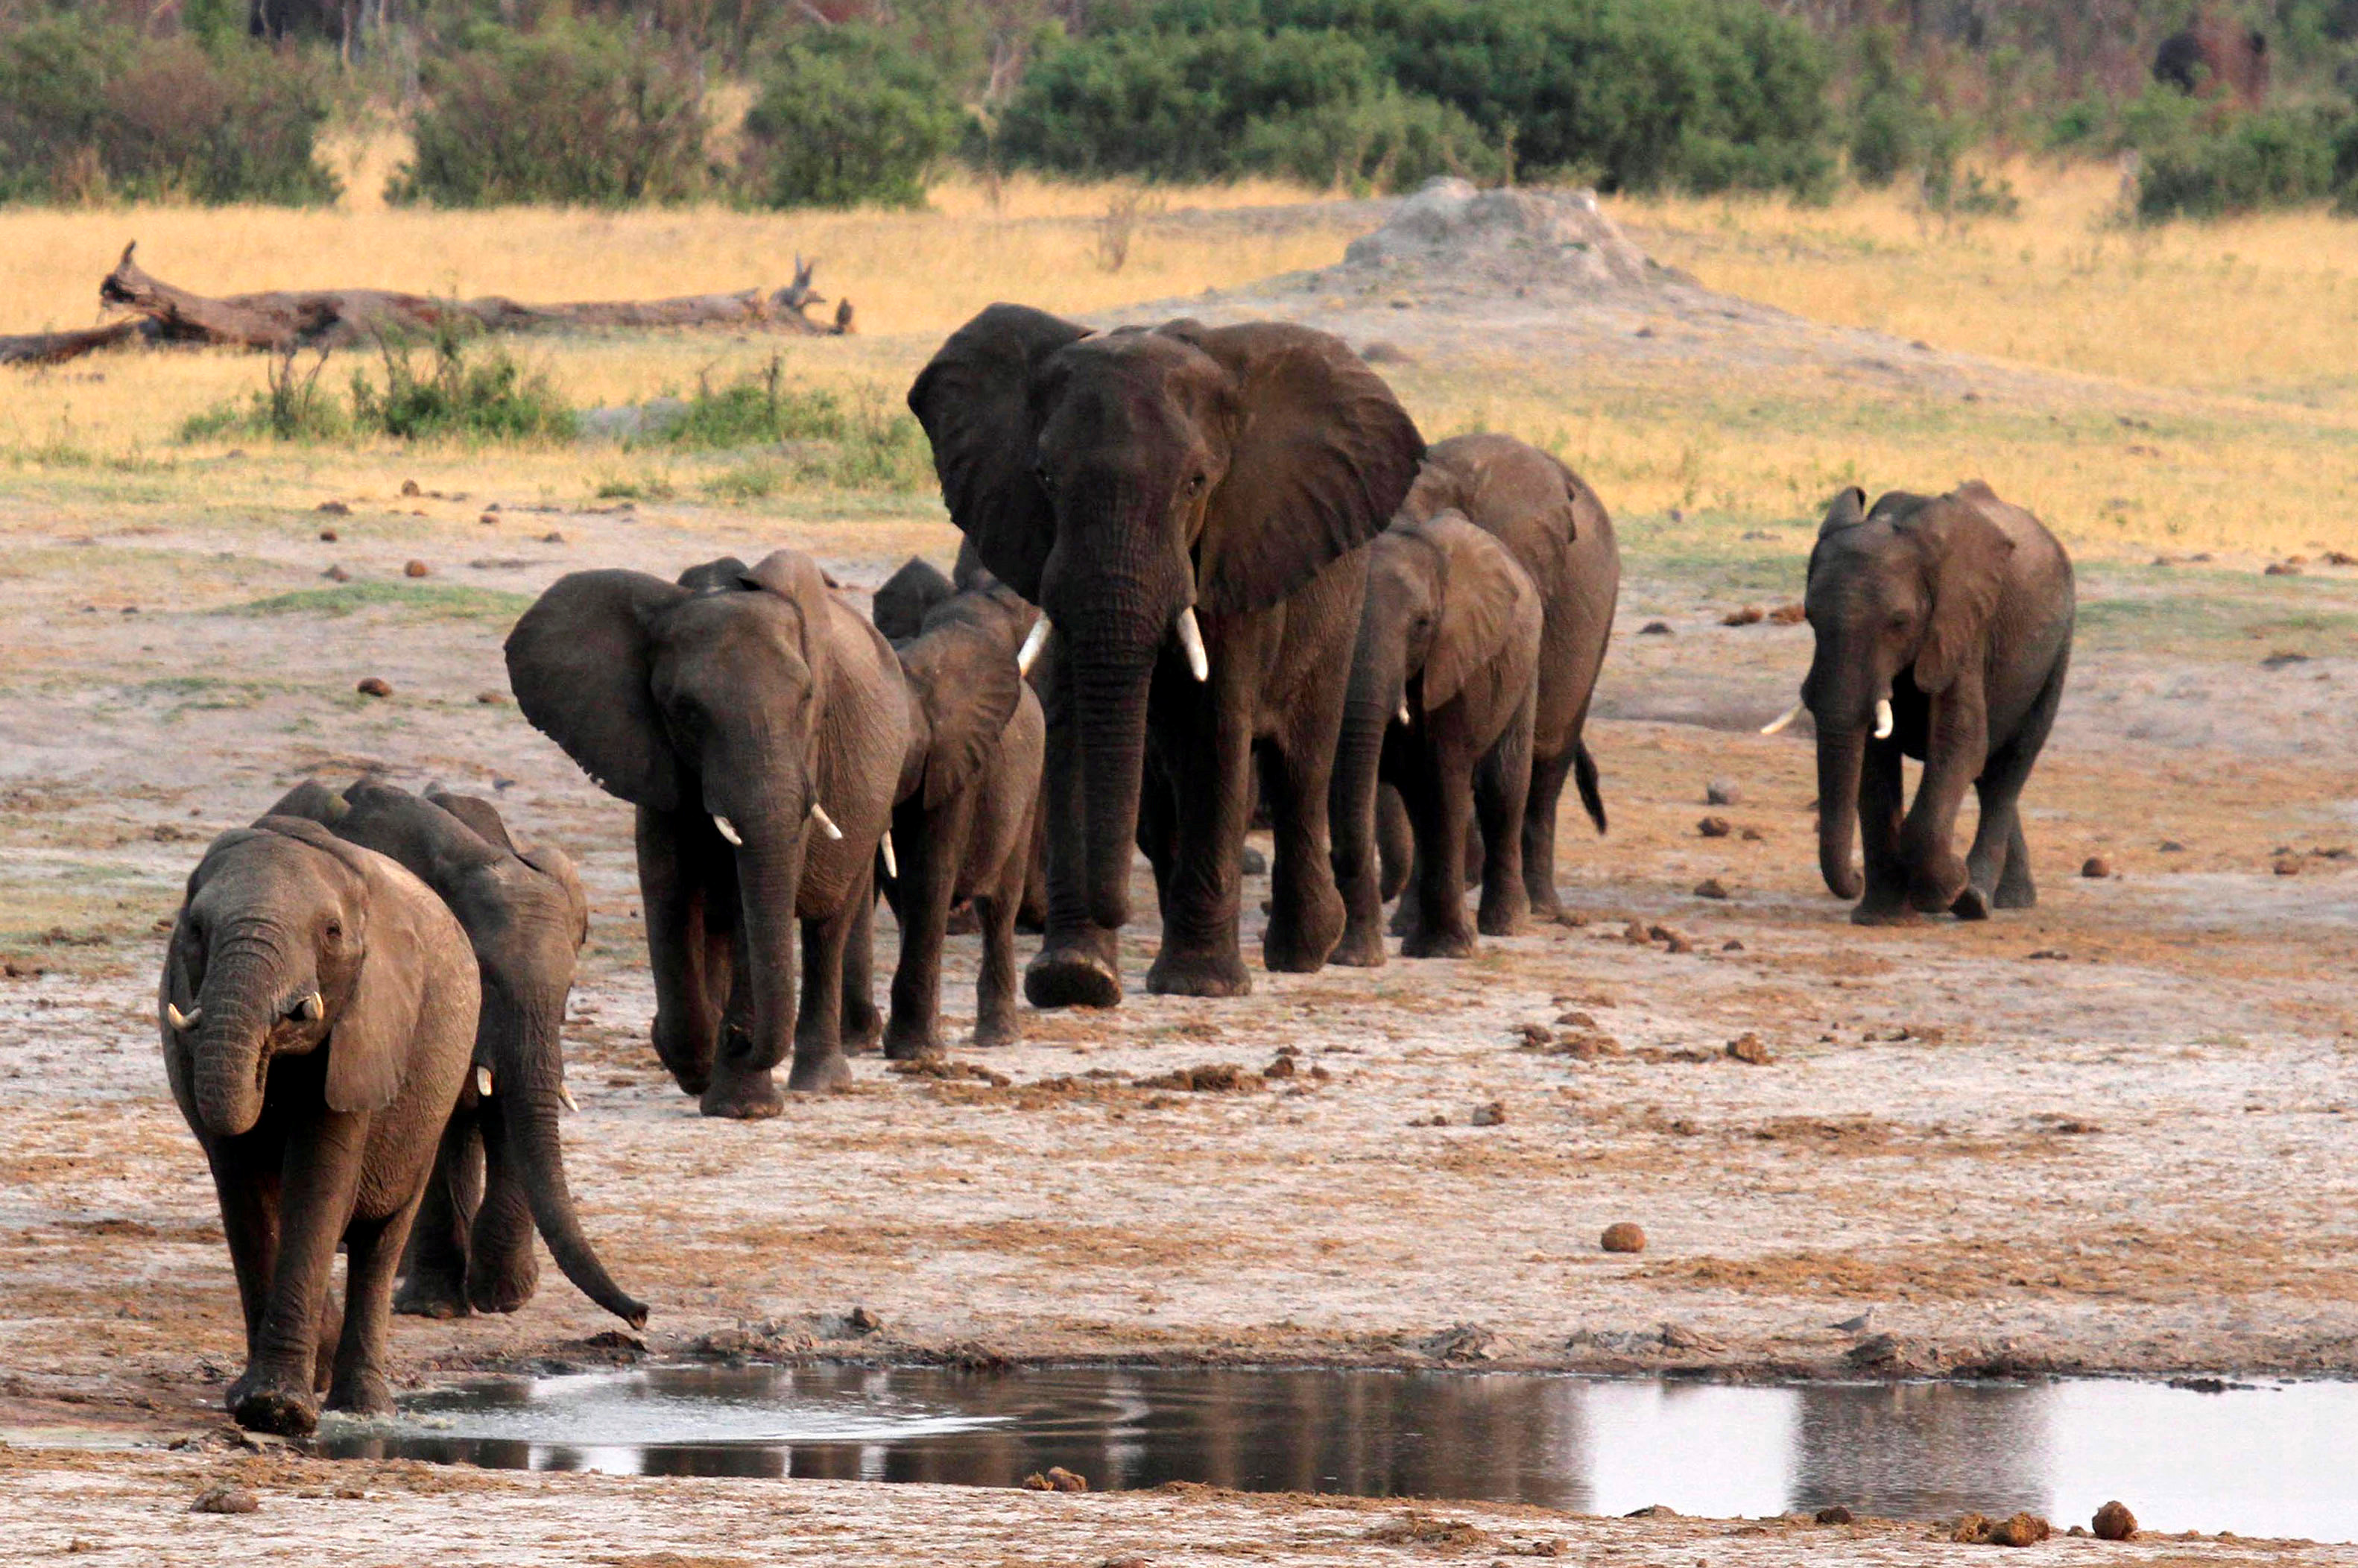 A herd of elephants walk past a watering hole in Hwange National Park, Zimbabwe, Oct. 14, 2014.